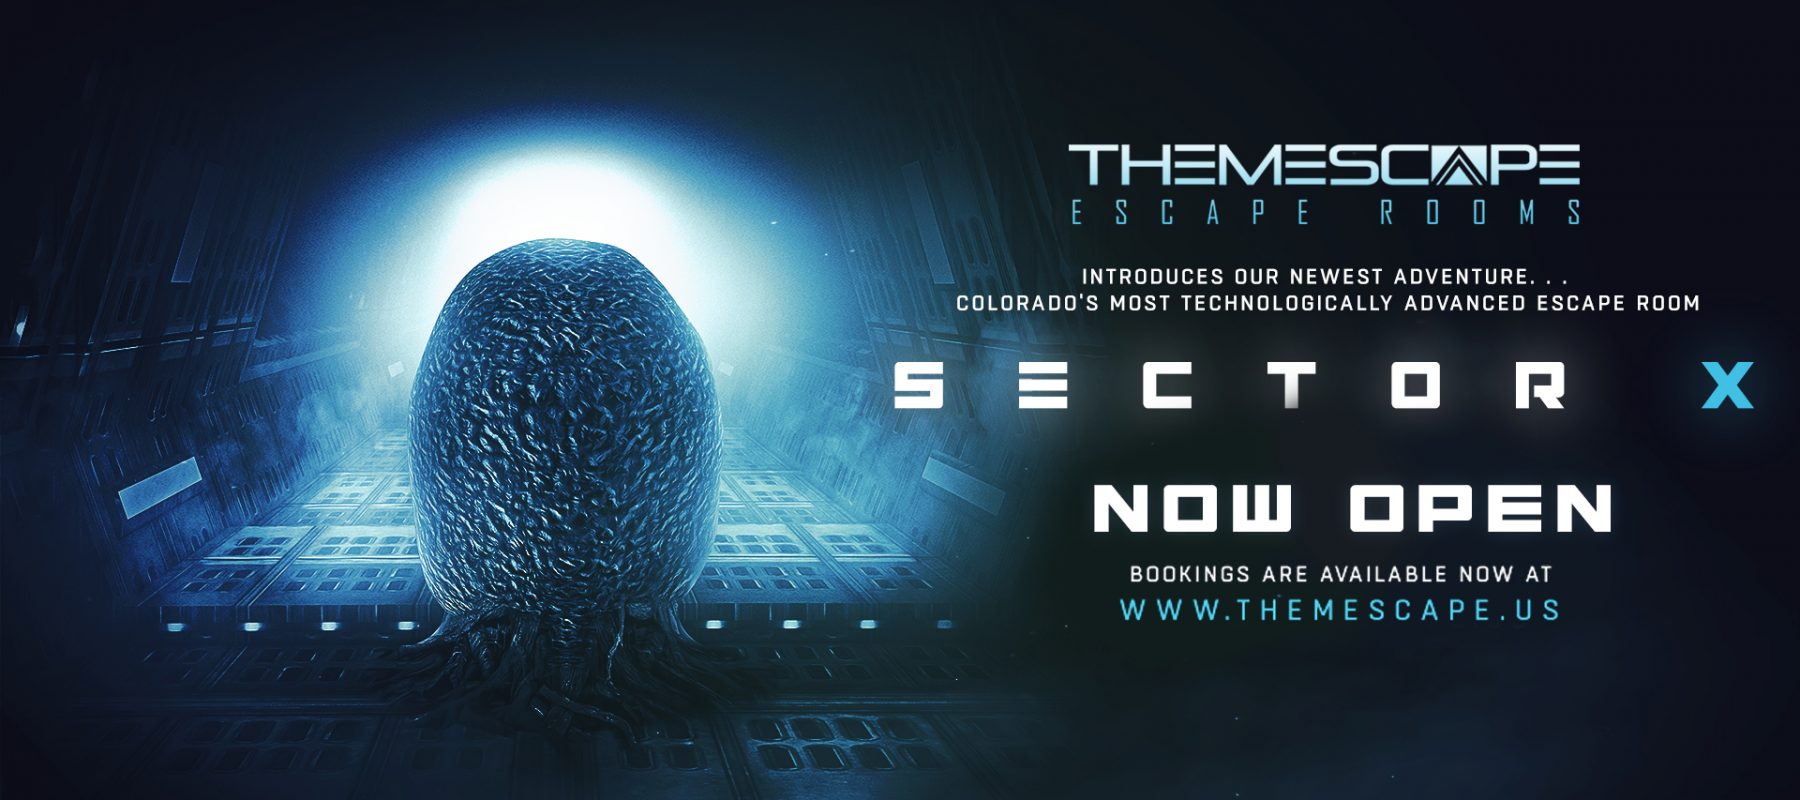 Escape Room 1 – Sector X